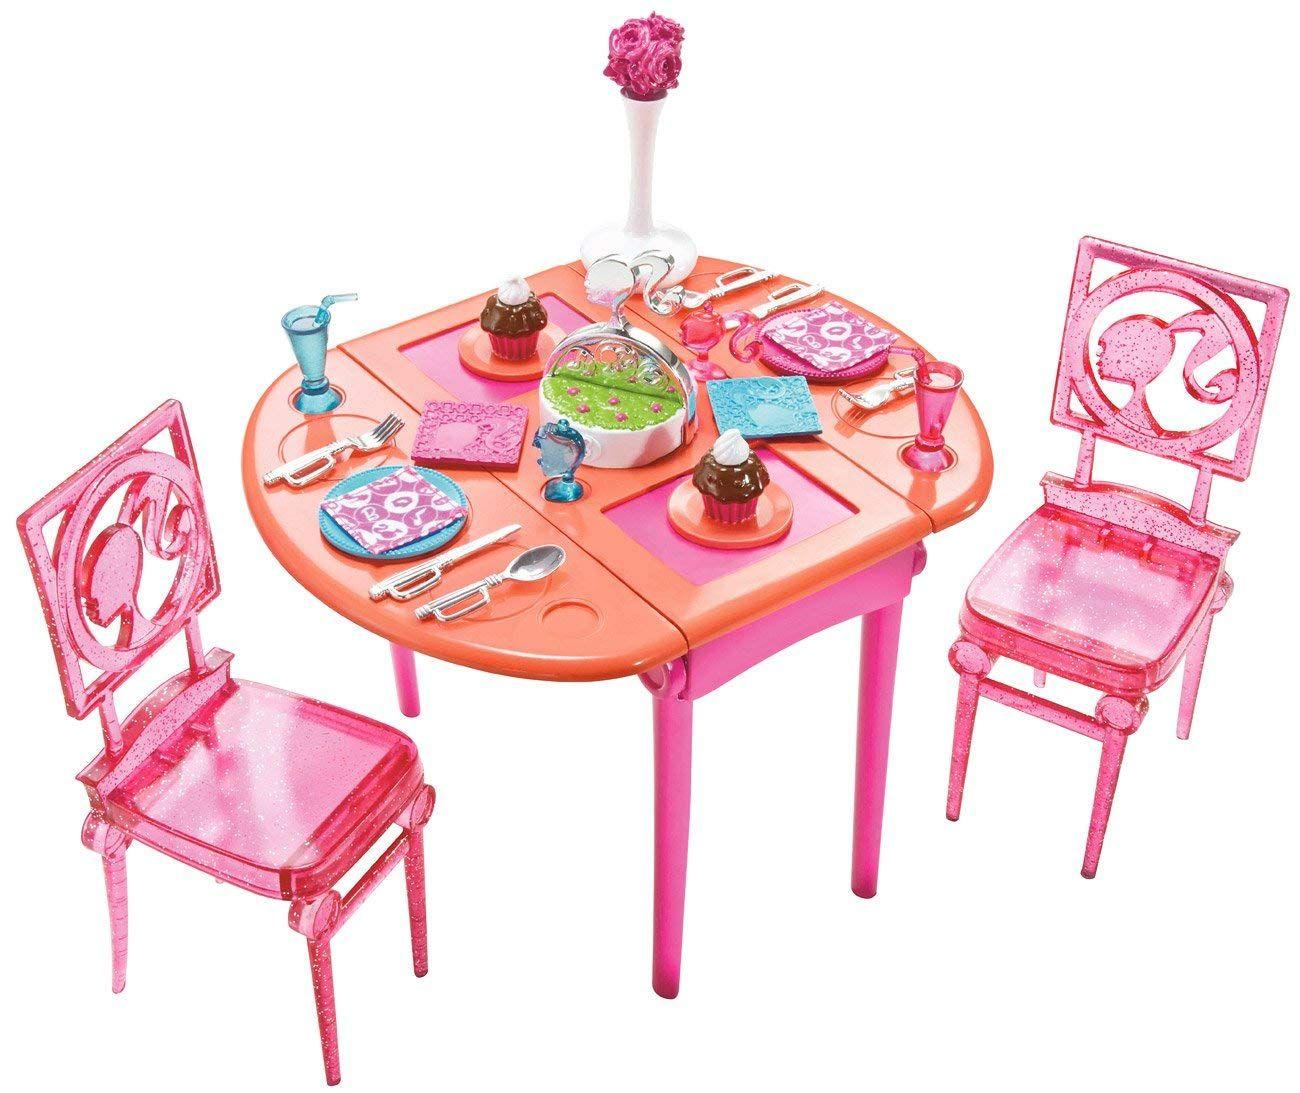 Barbie Basic Furniture Dinner To Dessert Dining Room Play Set Walmart Com Barbie Toys Barbie Doll House Barbie Furniture